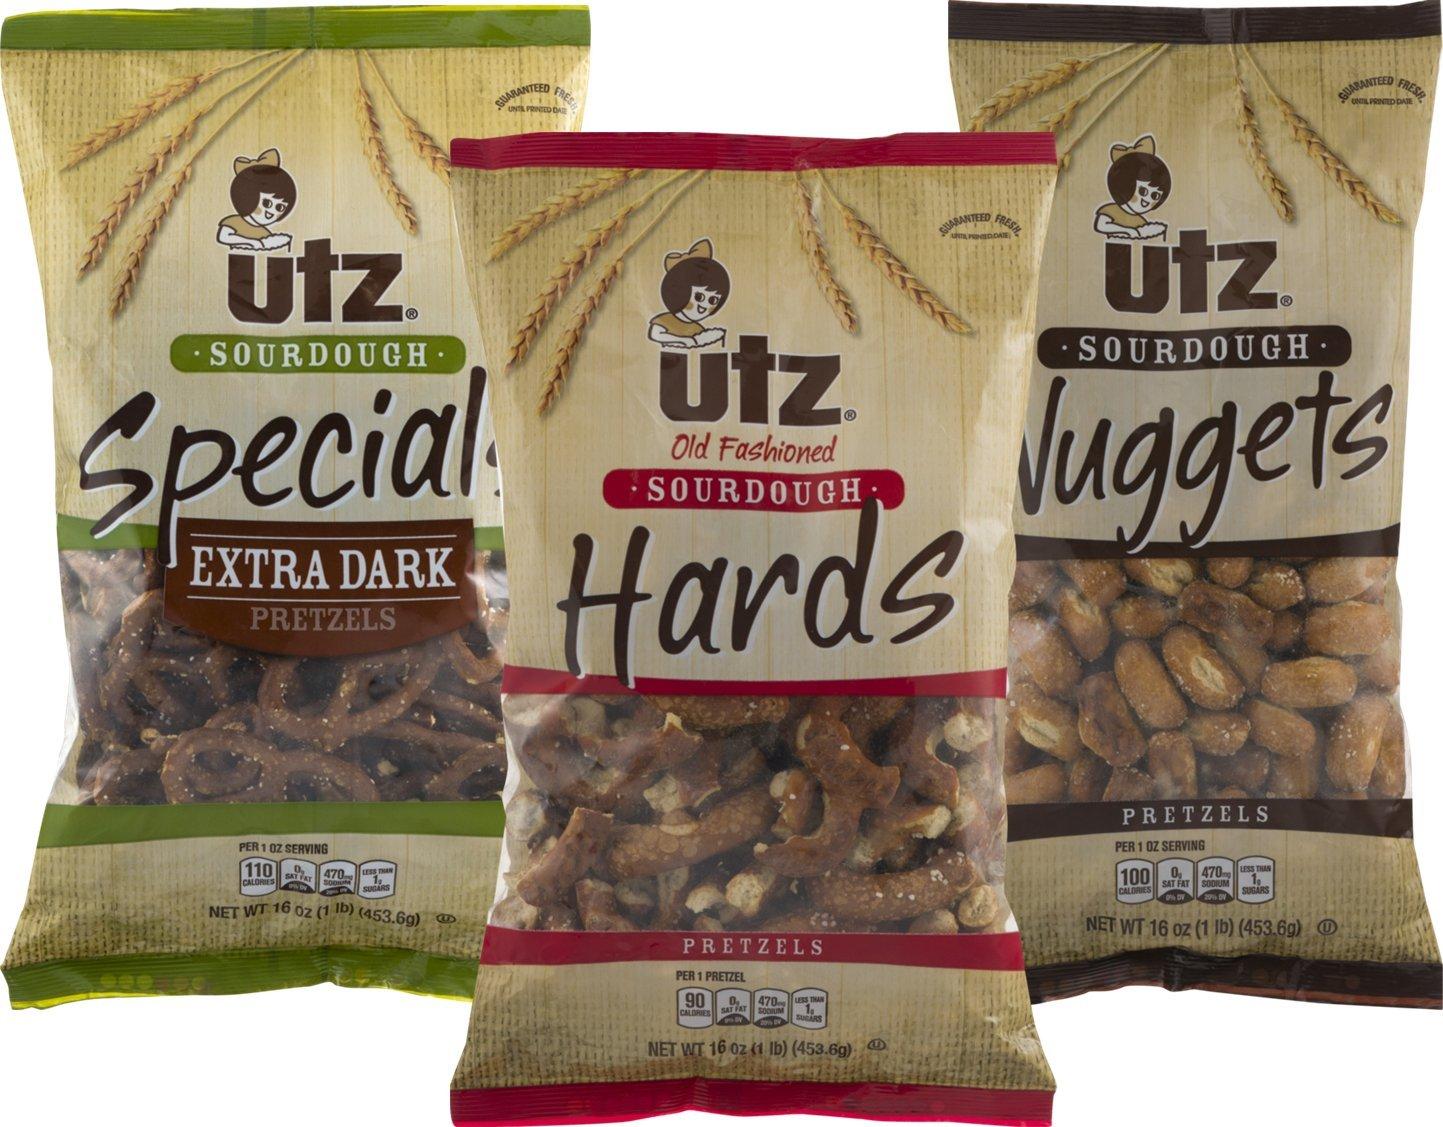 Utz Sourdough Extra Dark, Hards, Nuggets Pretzel Variety 3- Pack (16 oz. Bags)